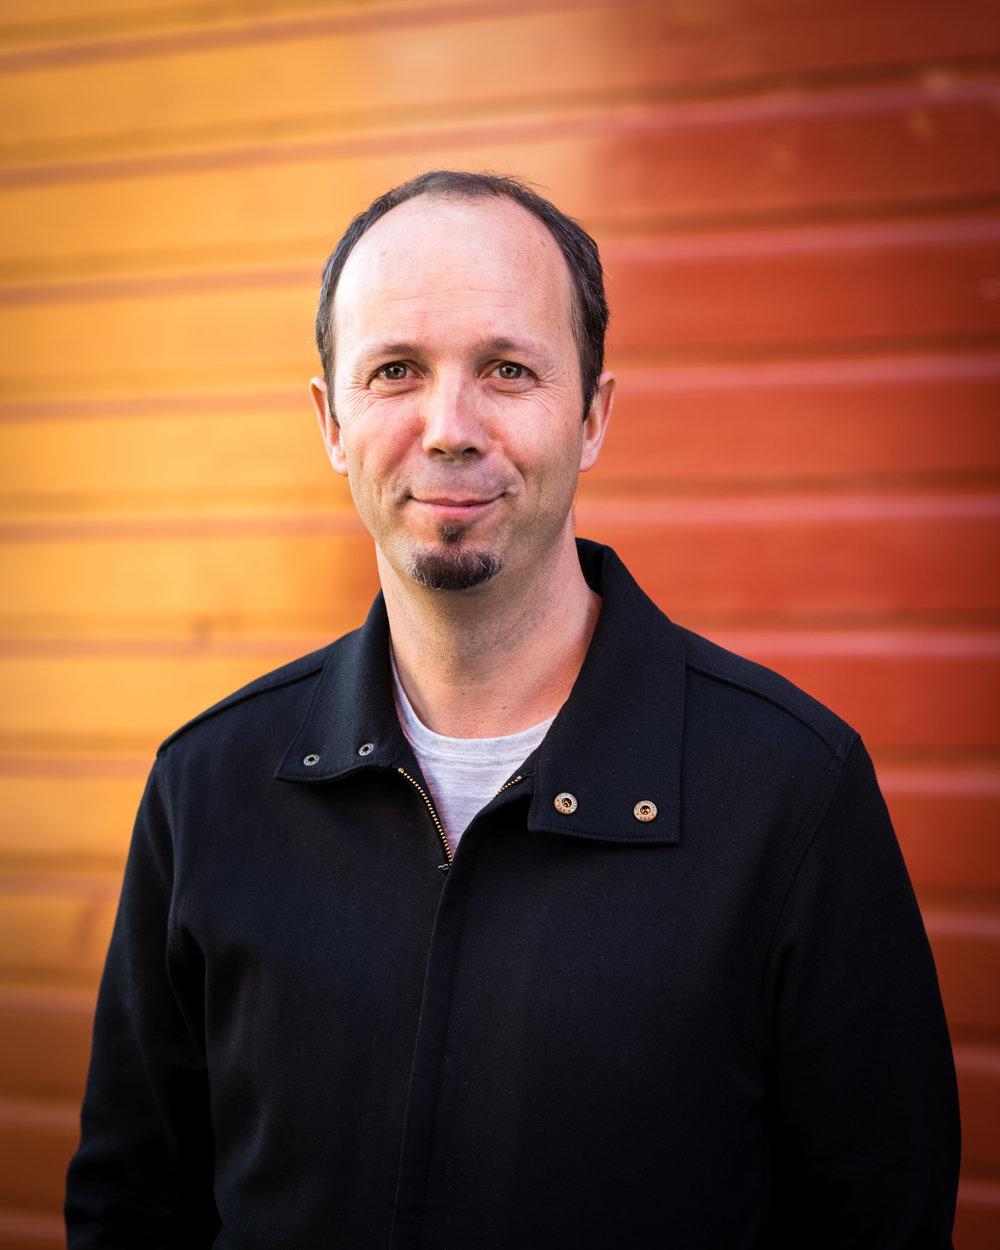 Ben, CoGo Co-Founder and CEO